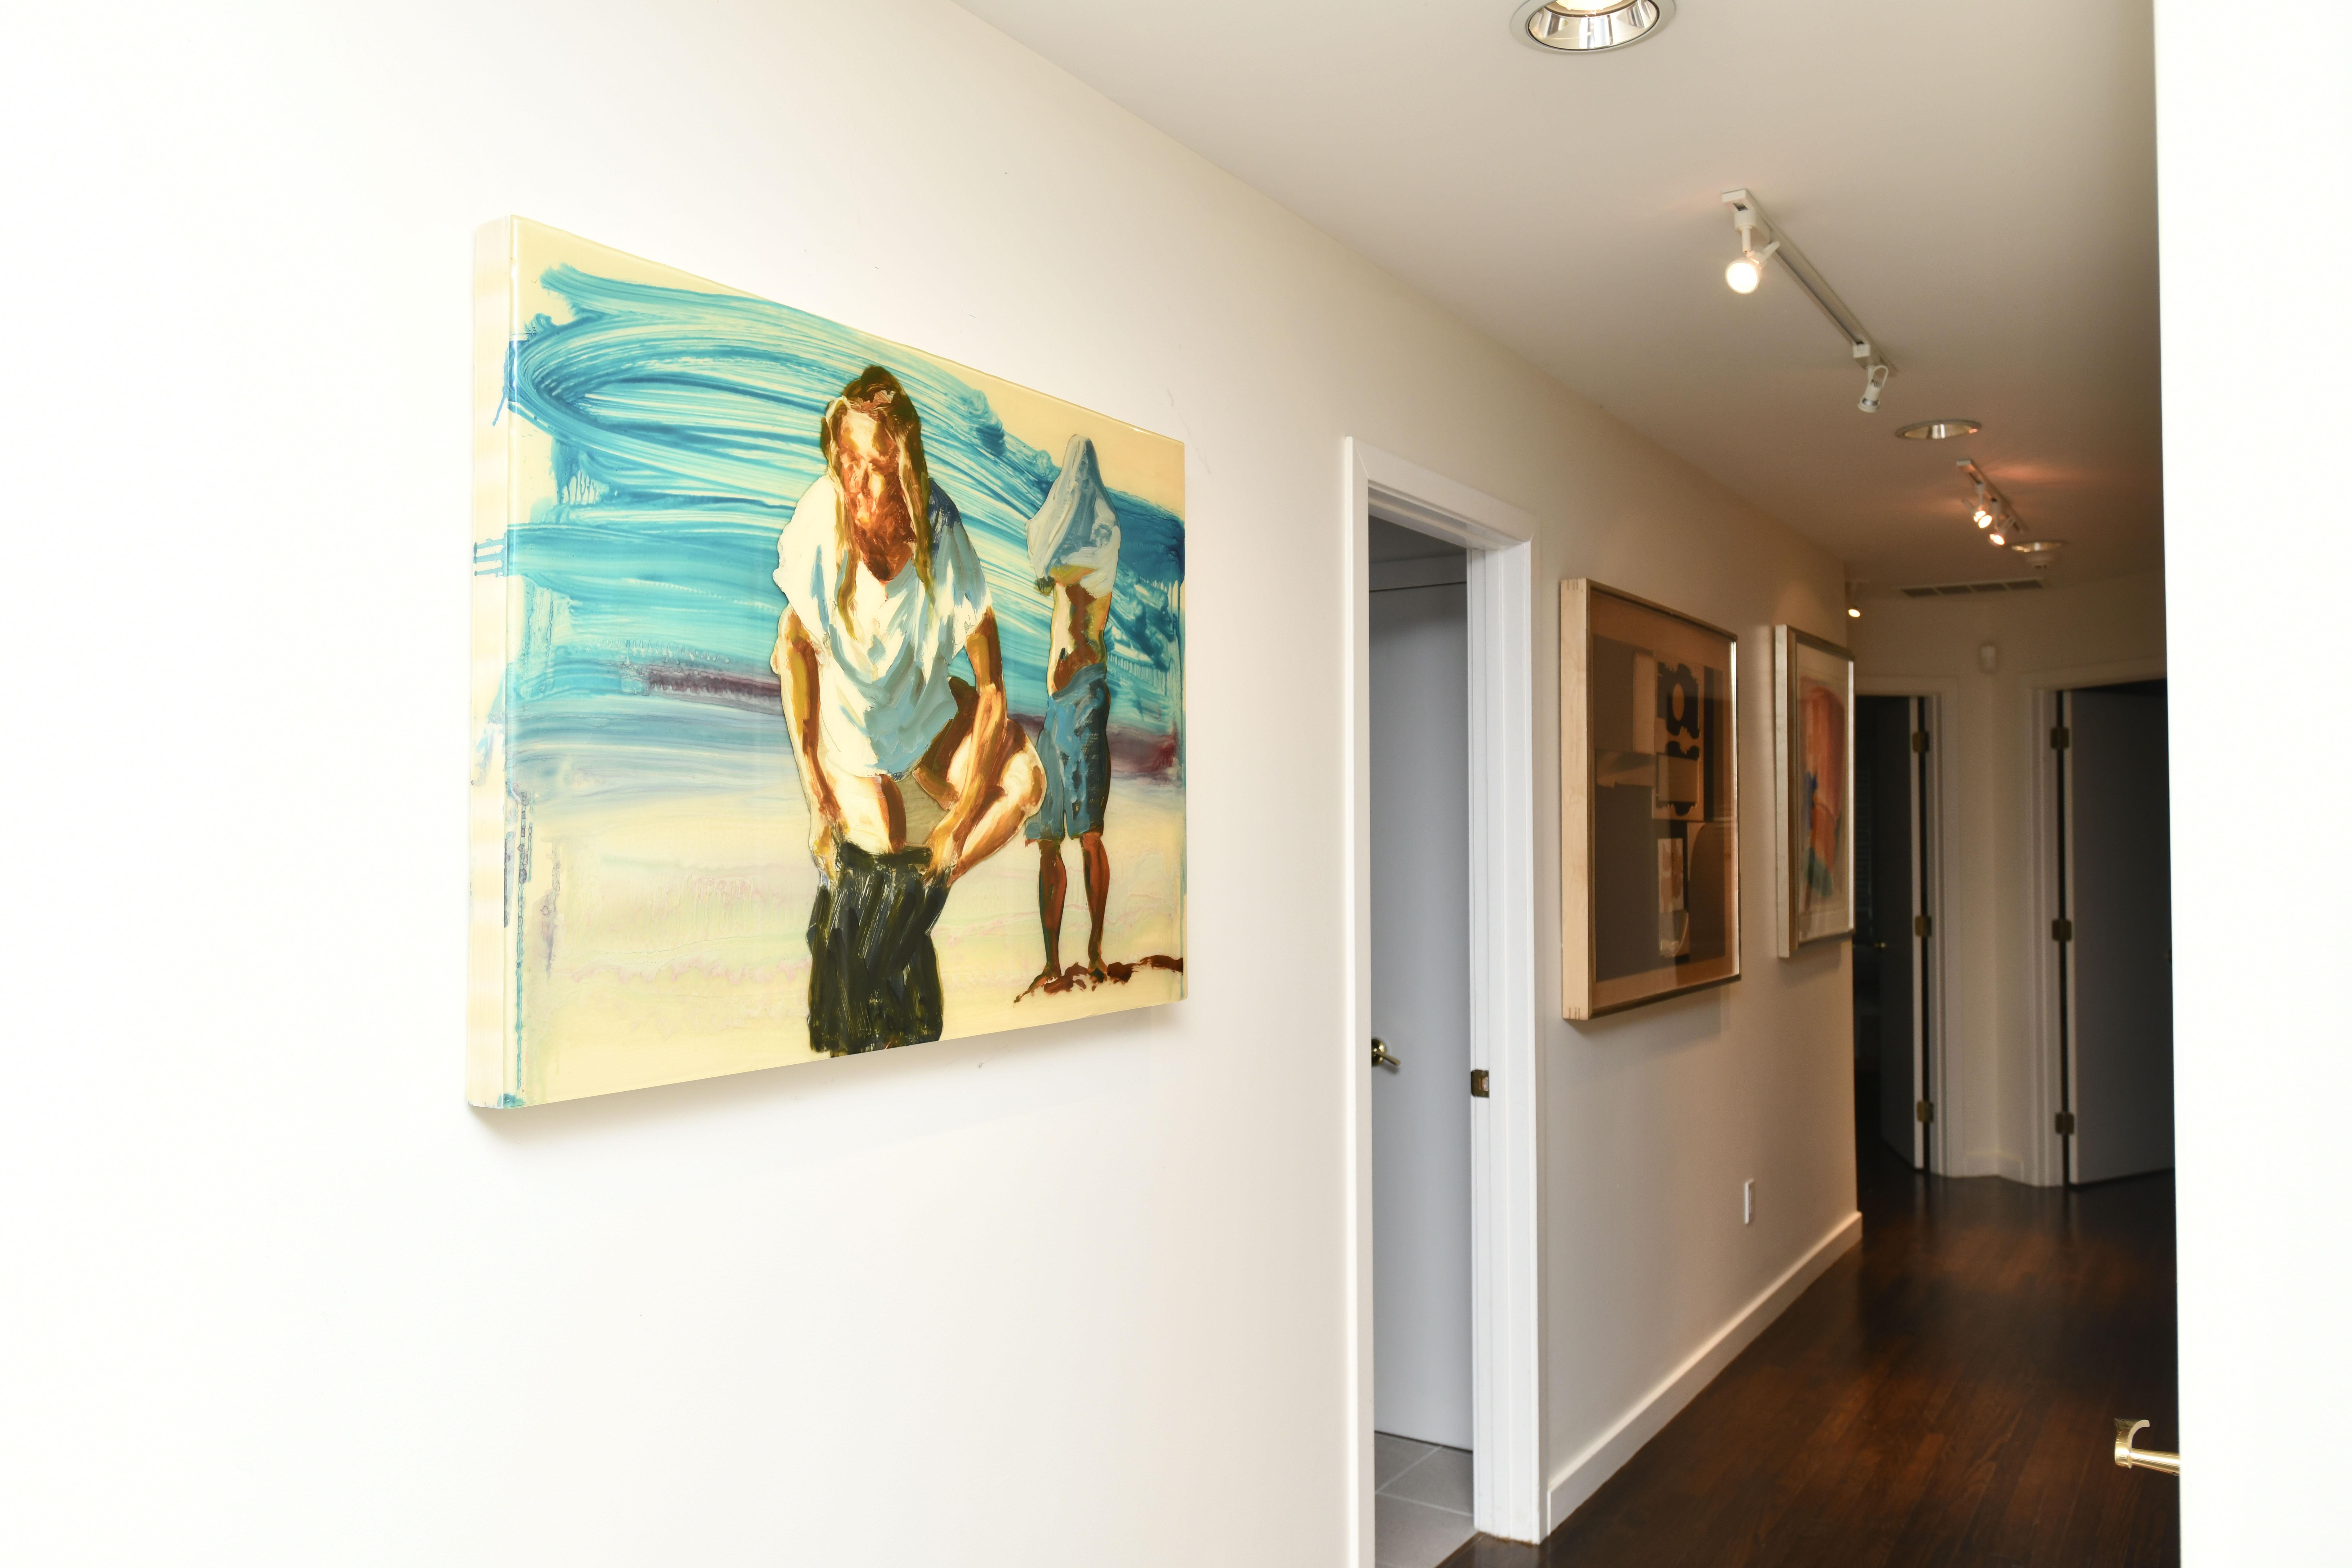 Artwork covers the walls in Rick Friedman's Southampton home. DANA SHAW